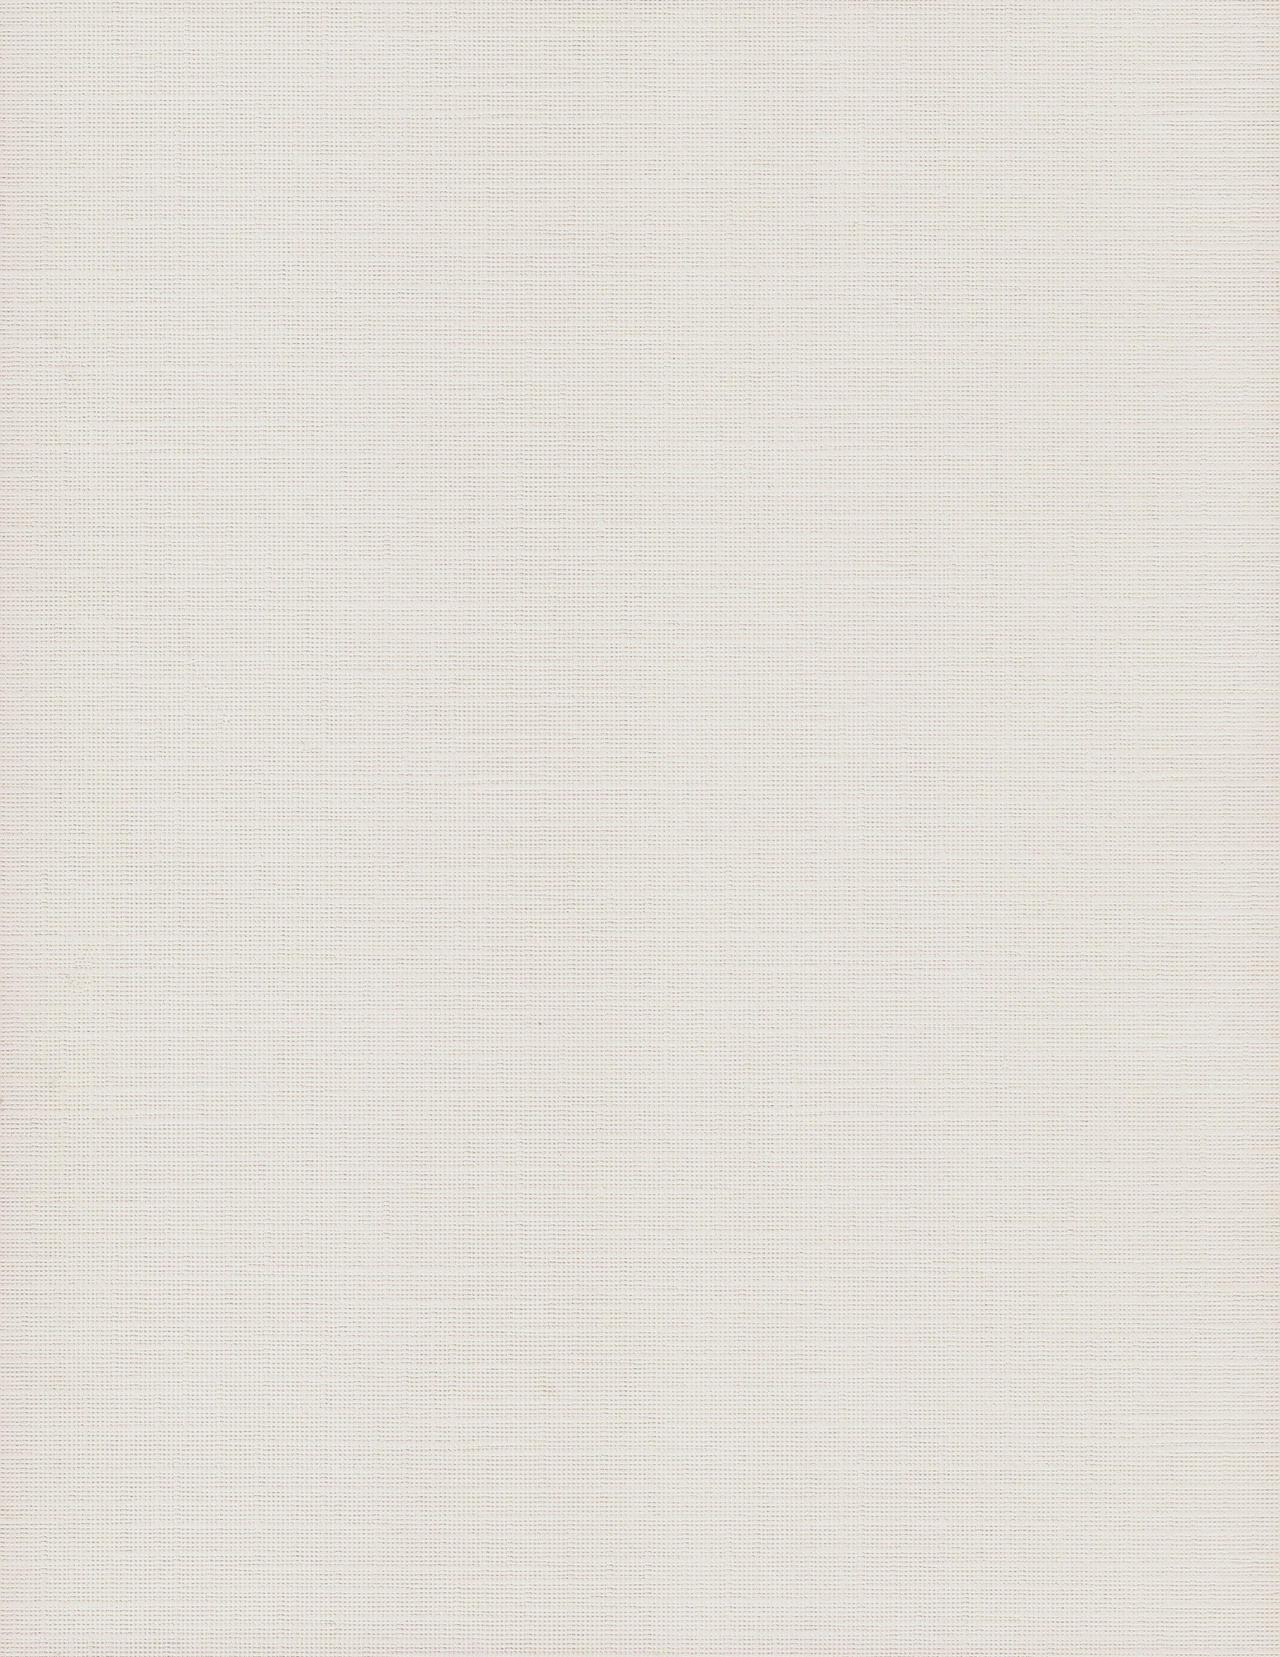 Canvas Texture White Paper